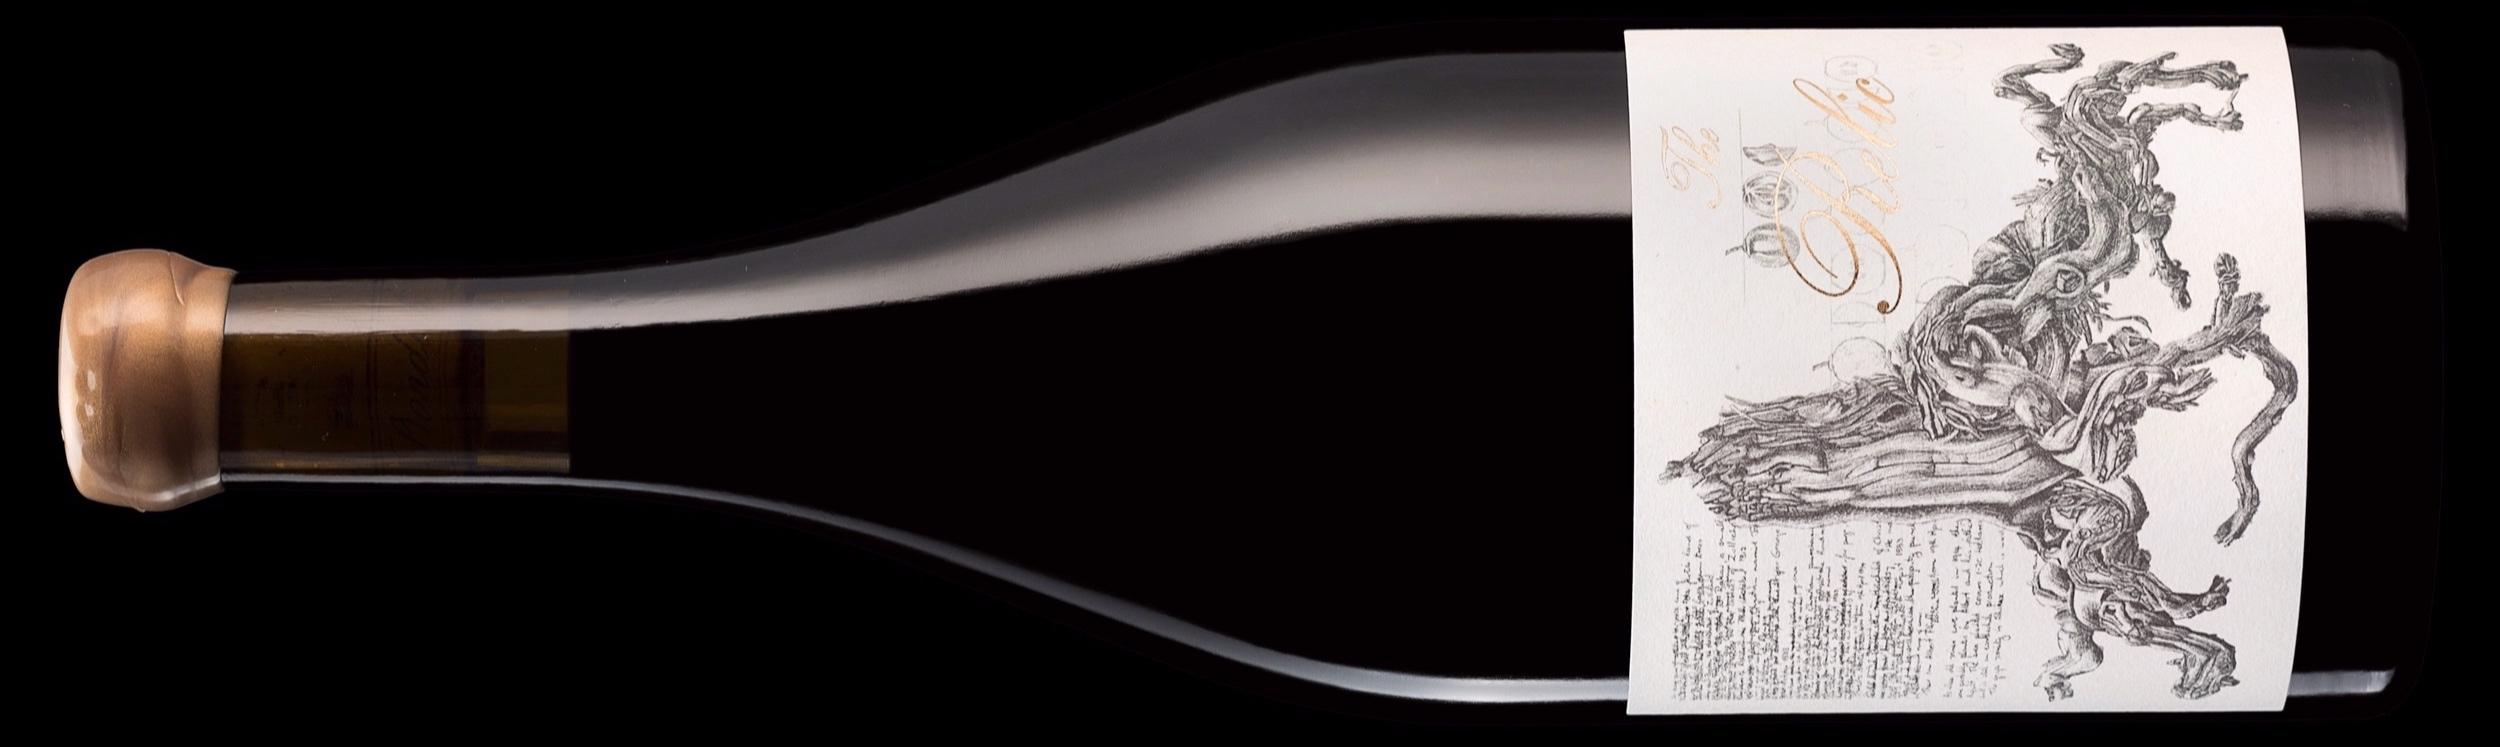 The Relic - Hongell Family Vineyard, Krondorf98% Shiraz 2% Viognier